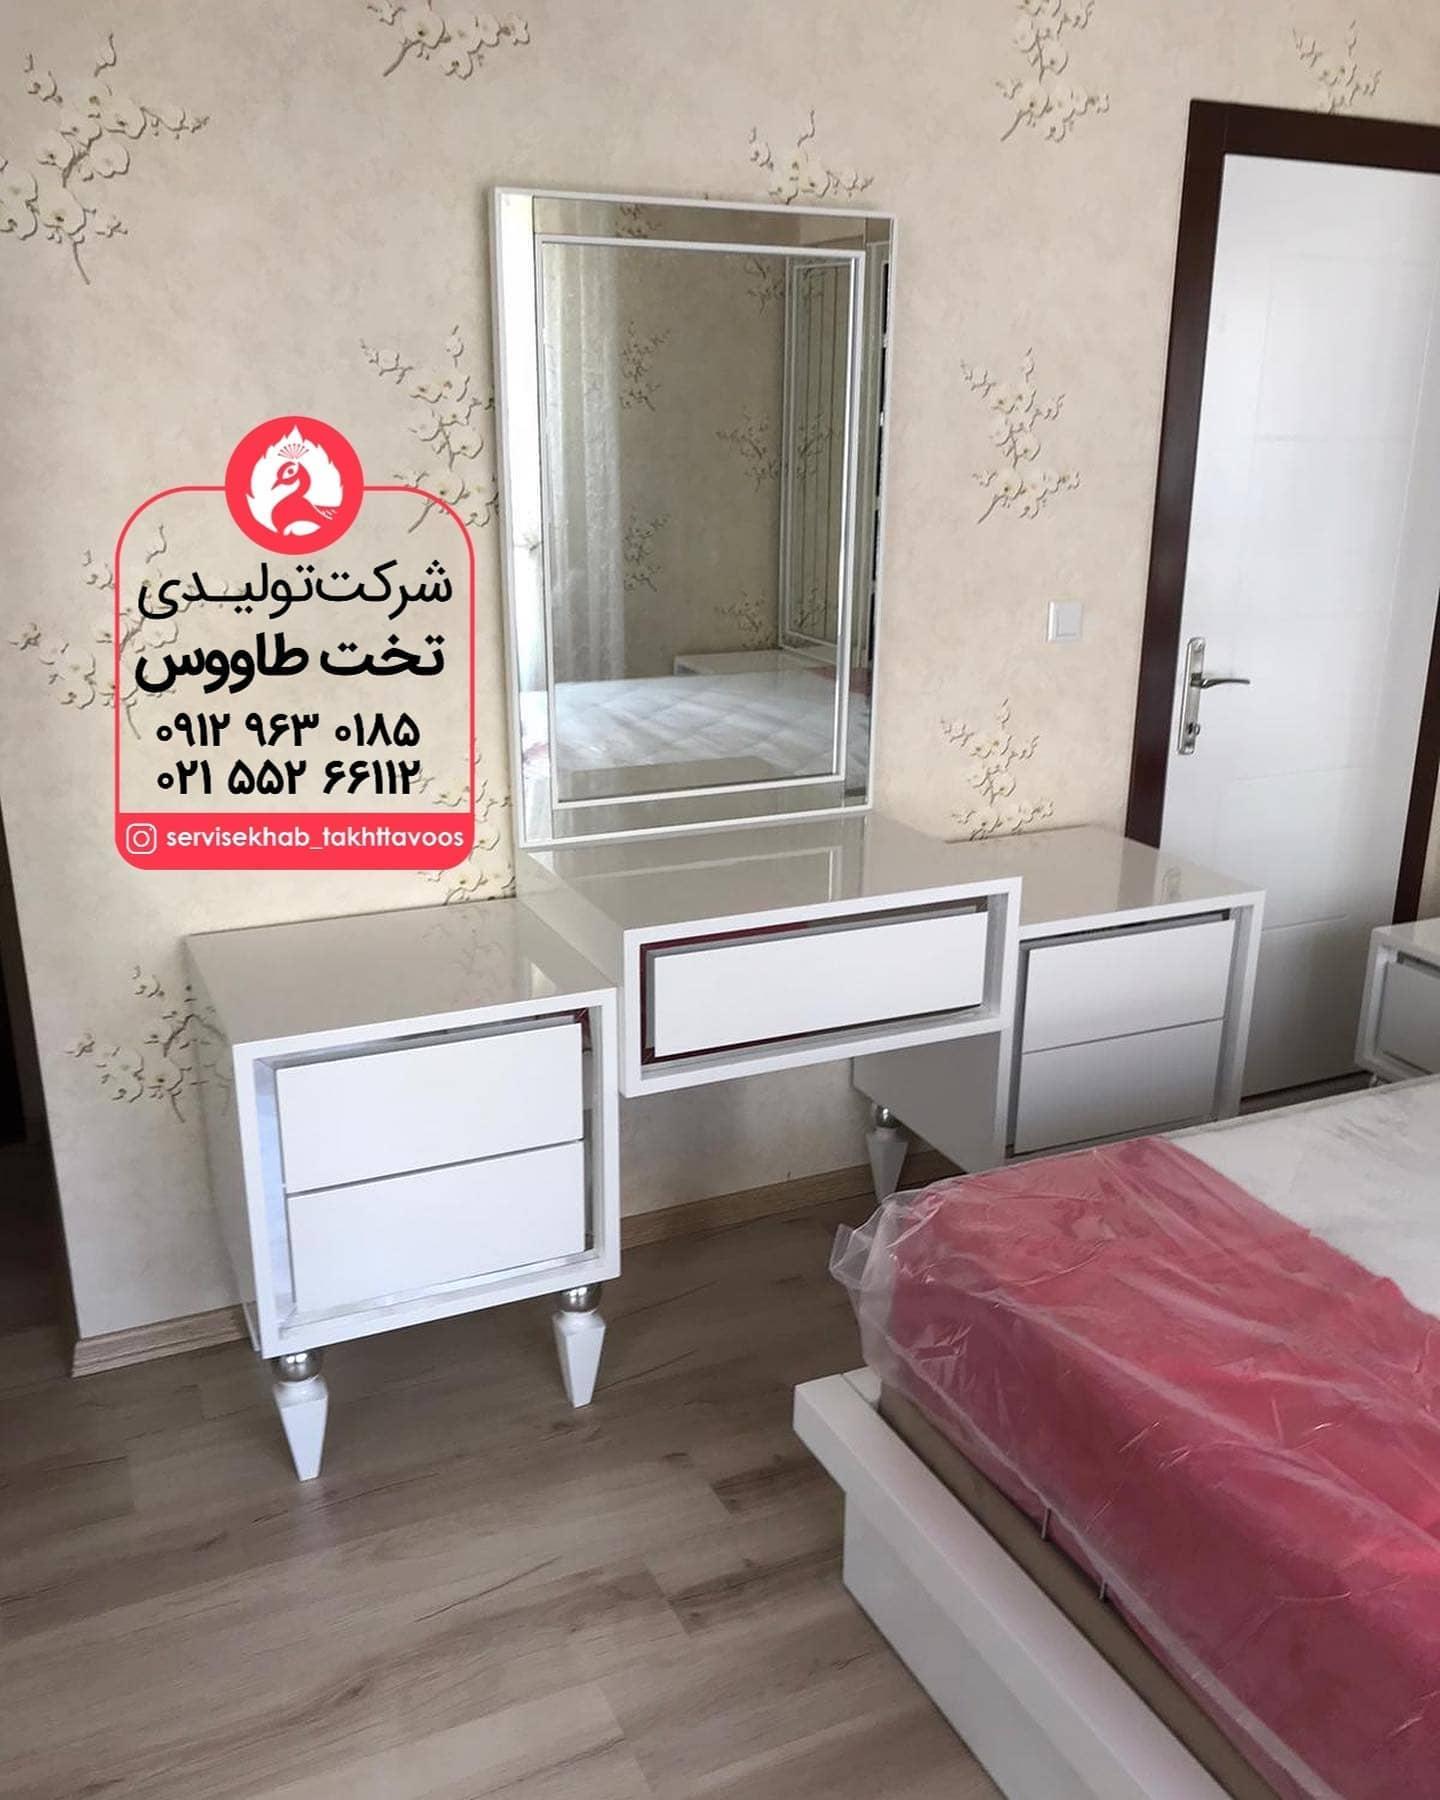 servicekhab_takhttavoos-20210914-0003